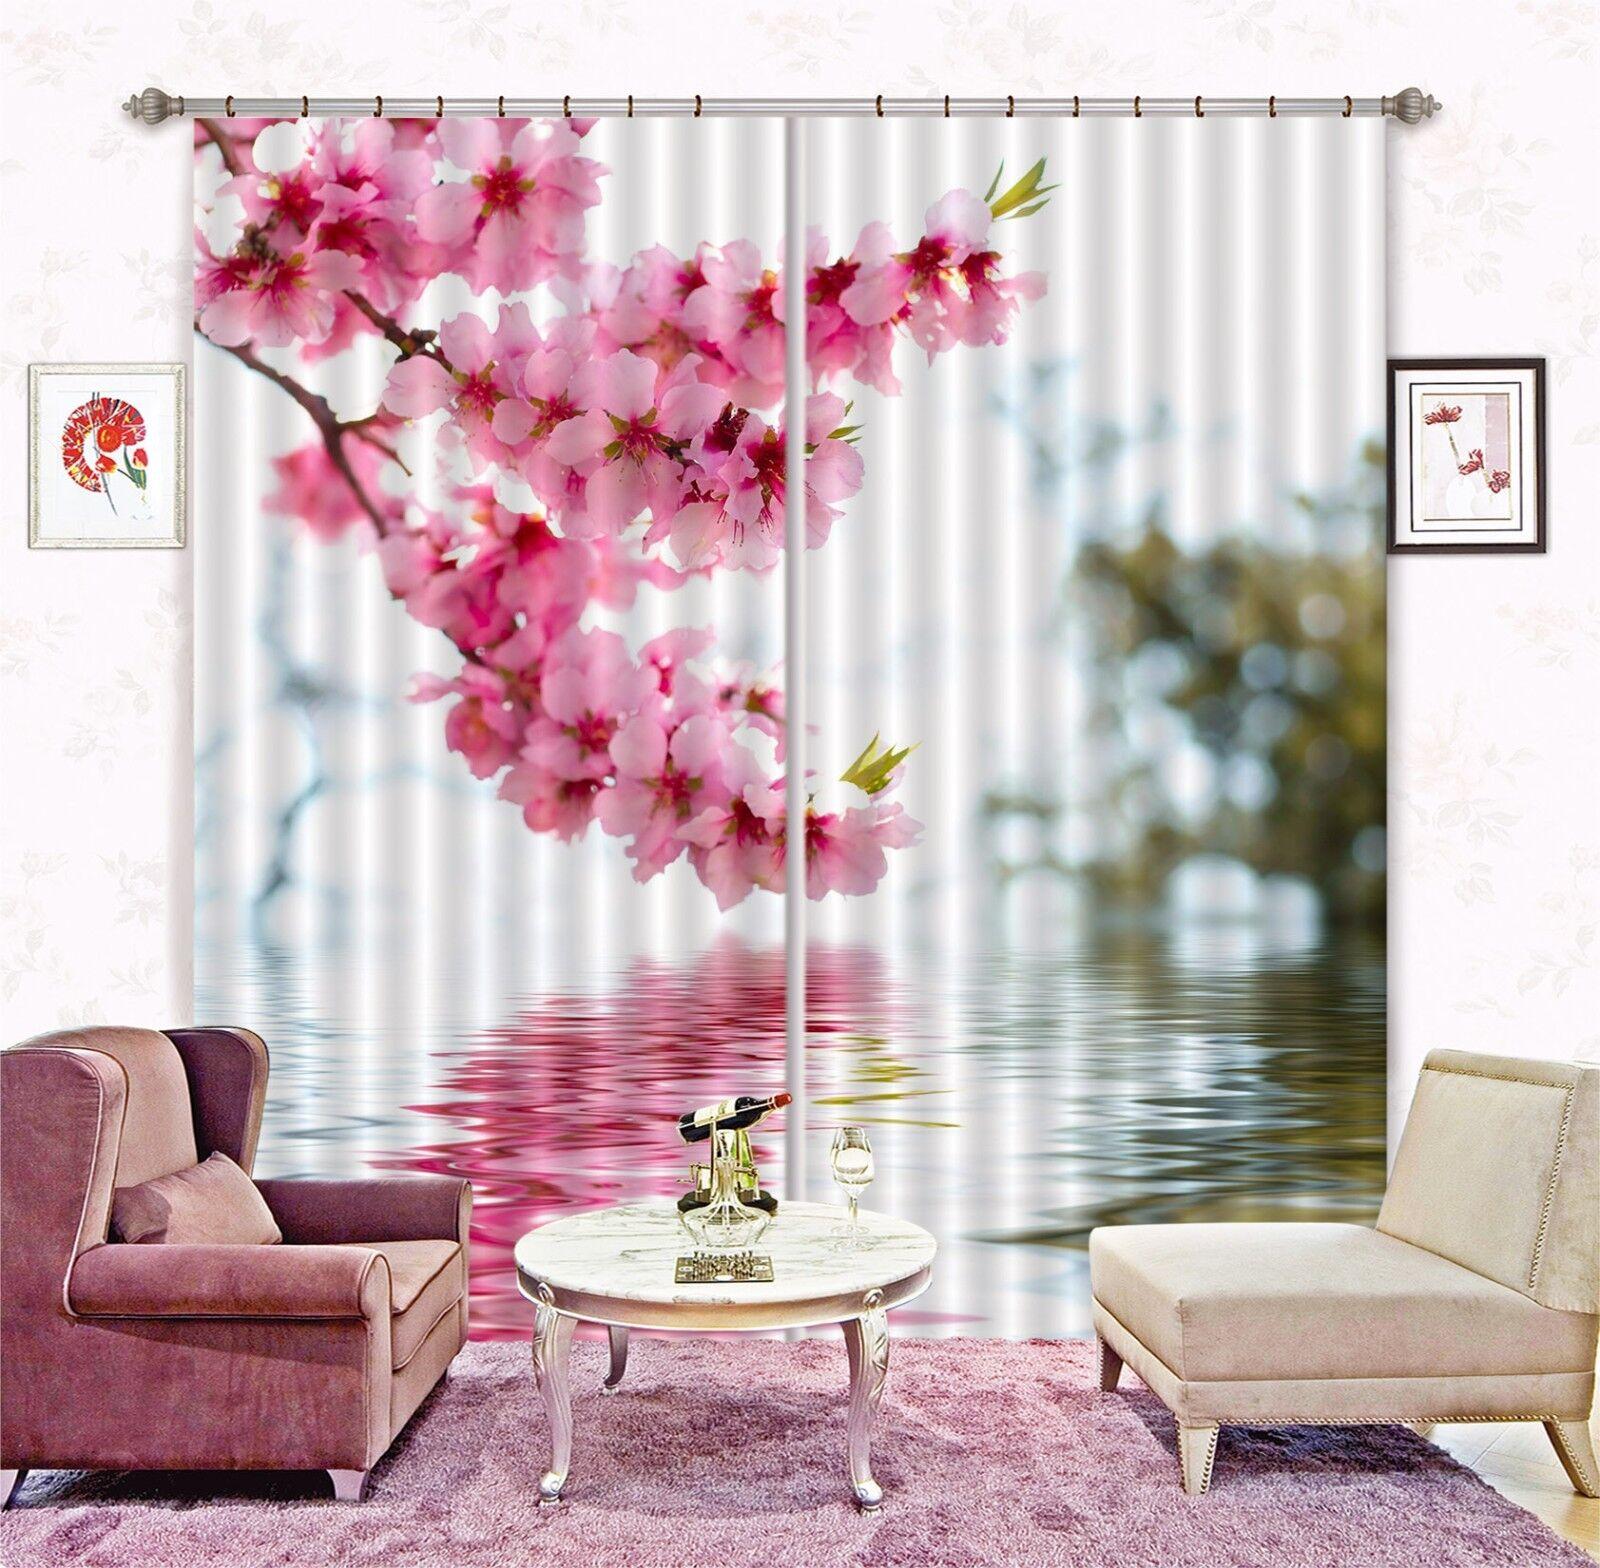 3D Flores 3318 Cortinas de impresión de cortina de foto Blockout Tela Cortinas Ventana au